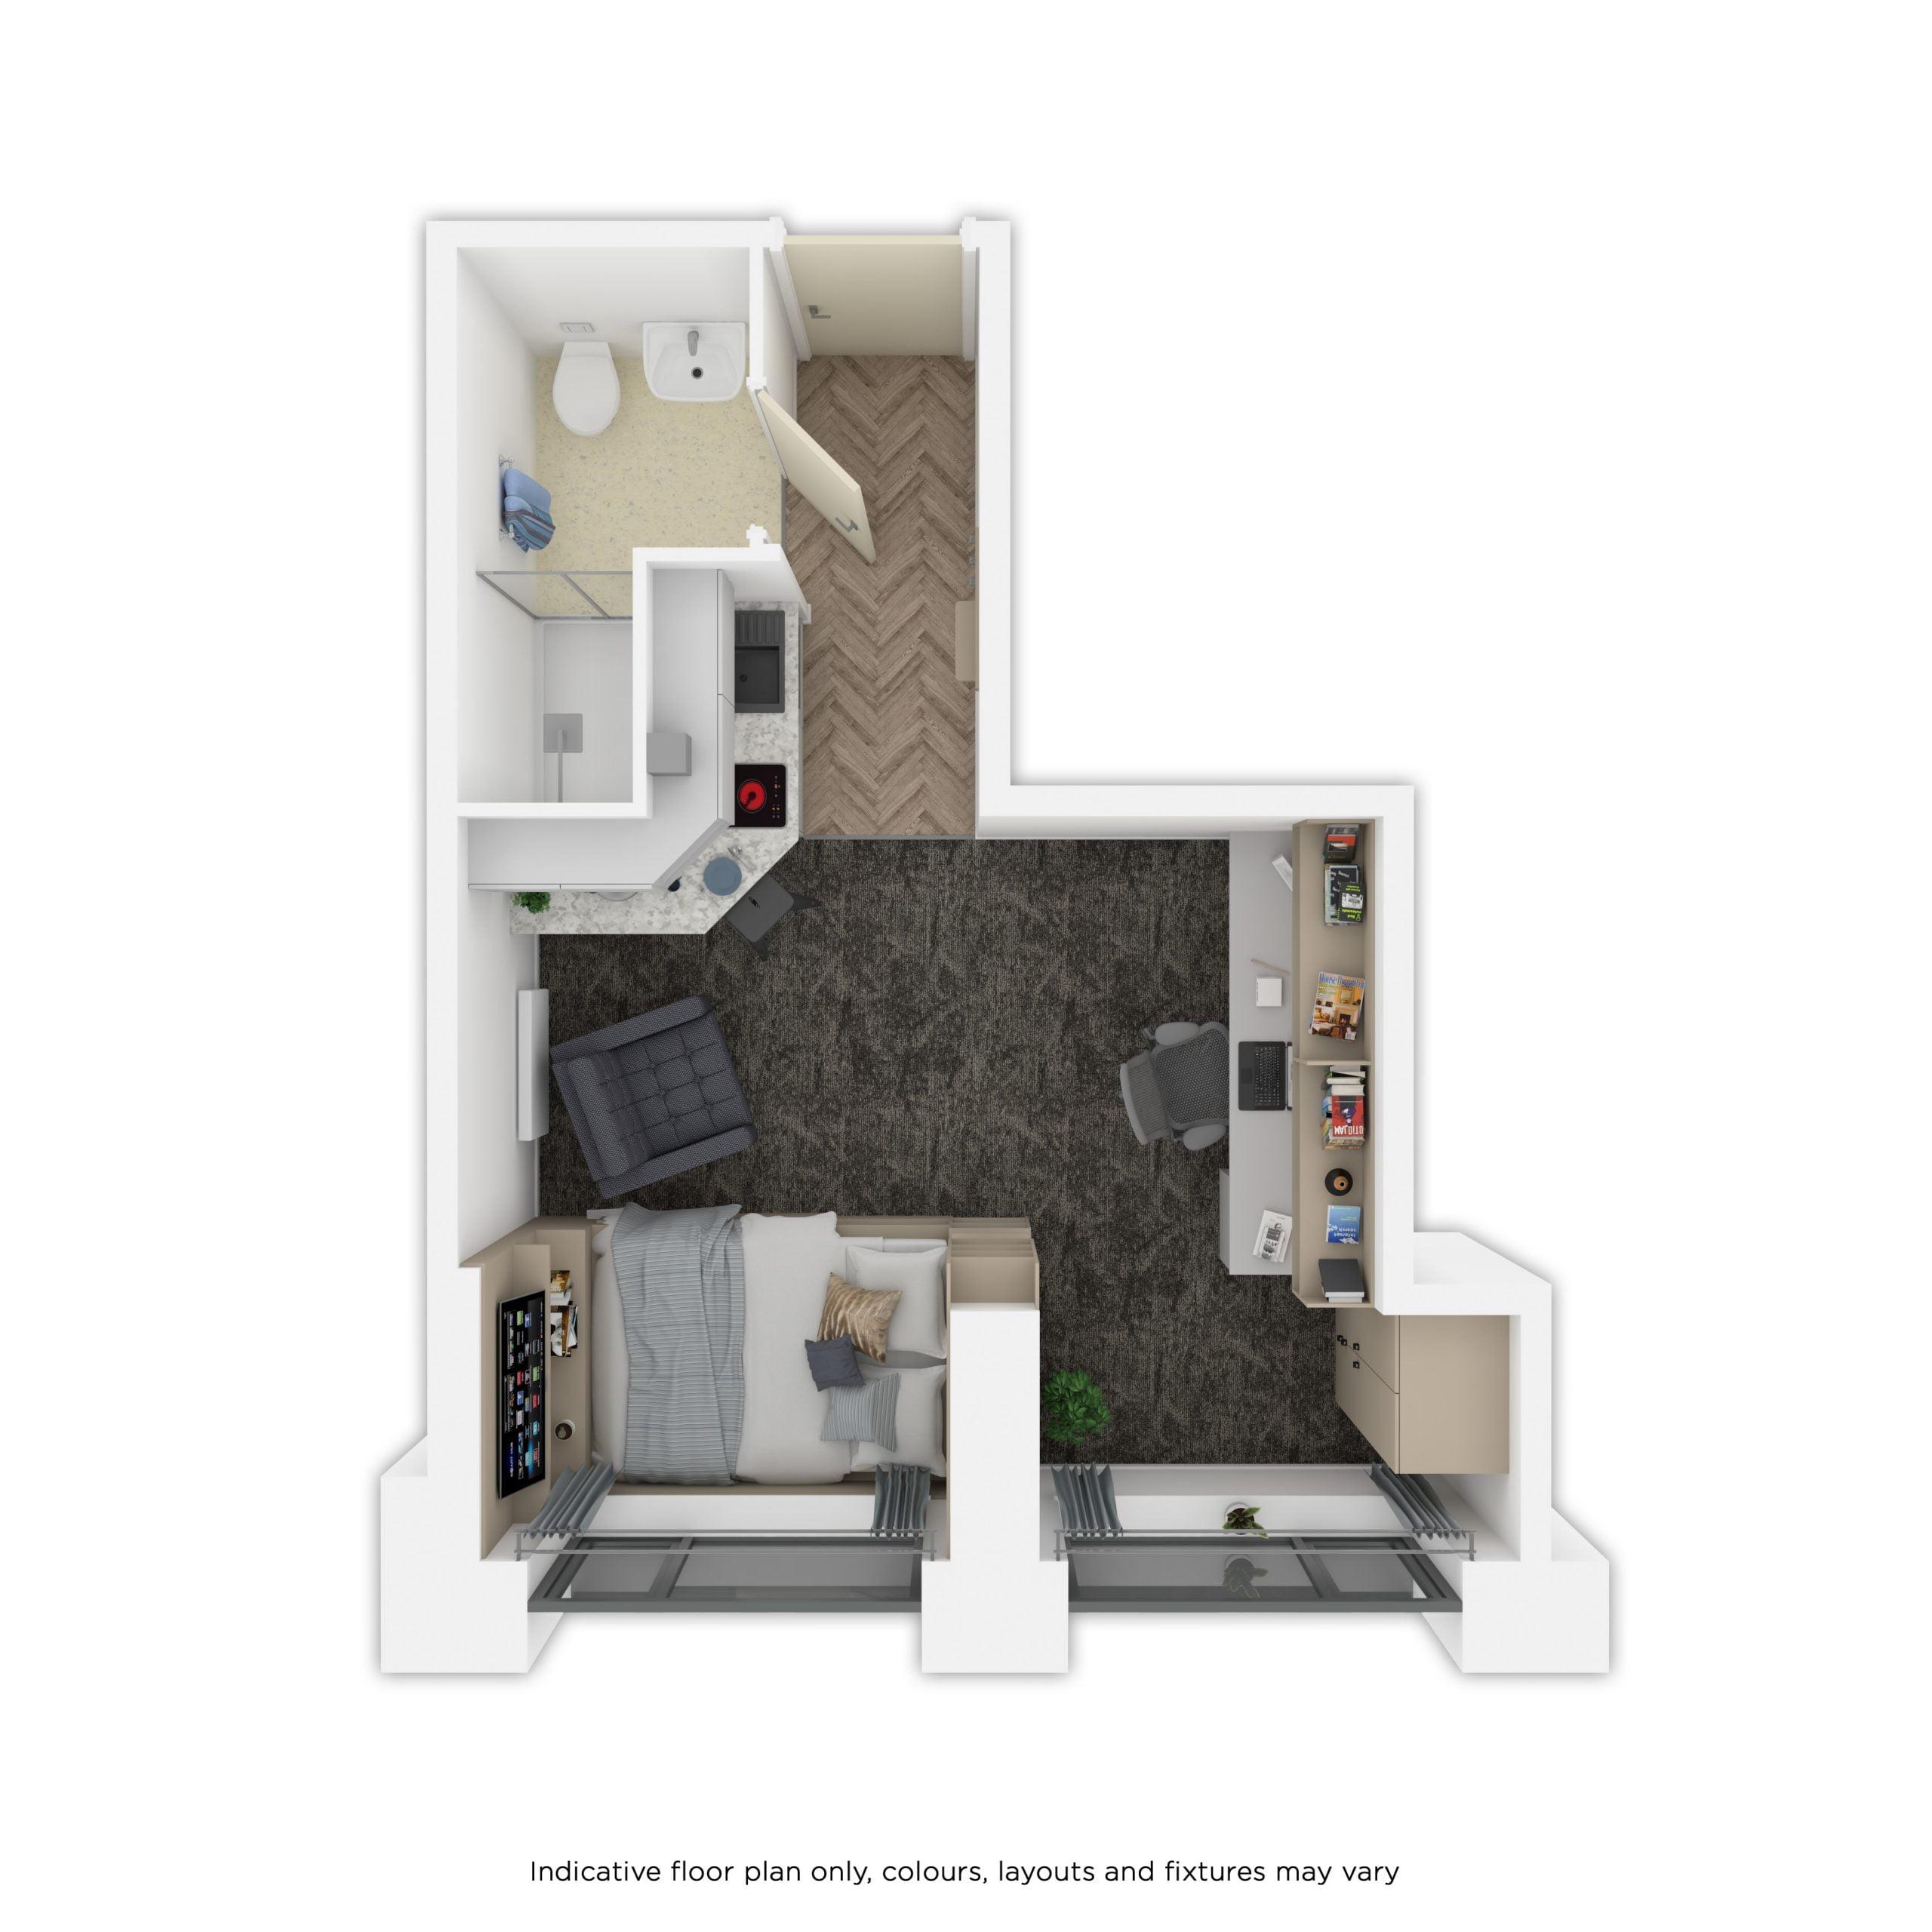 Indicative silver studio floor plan